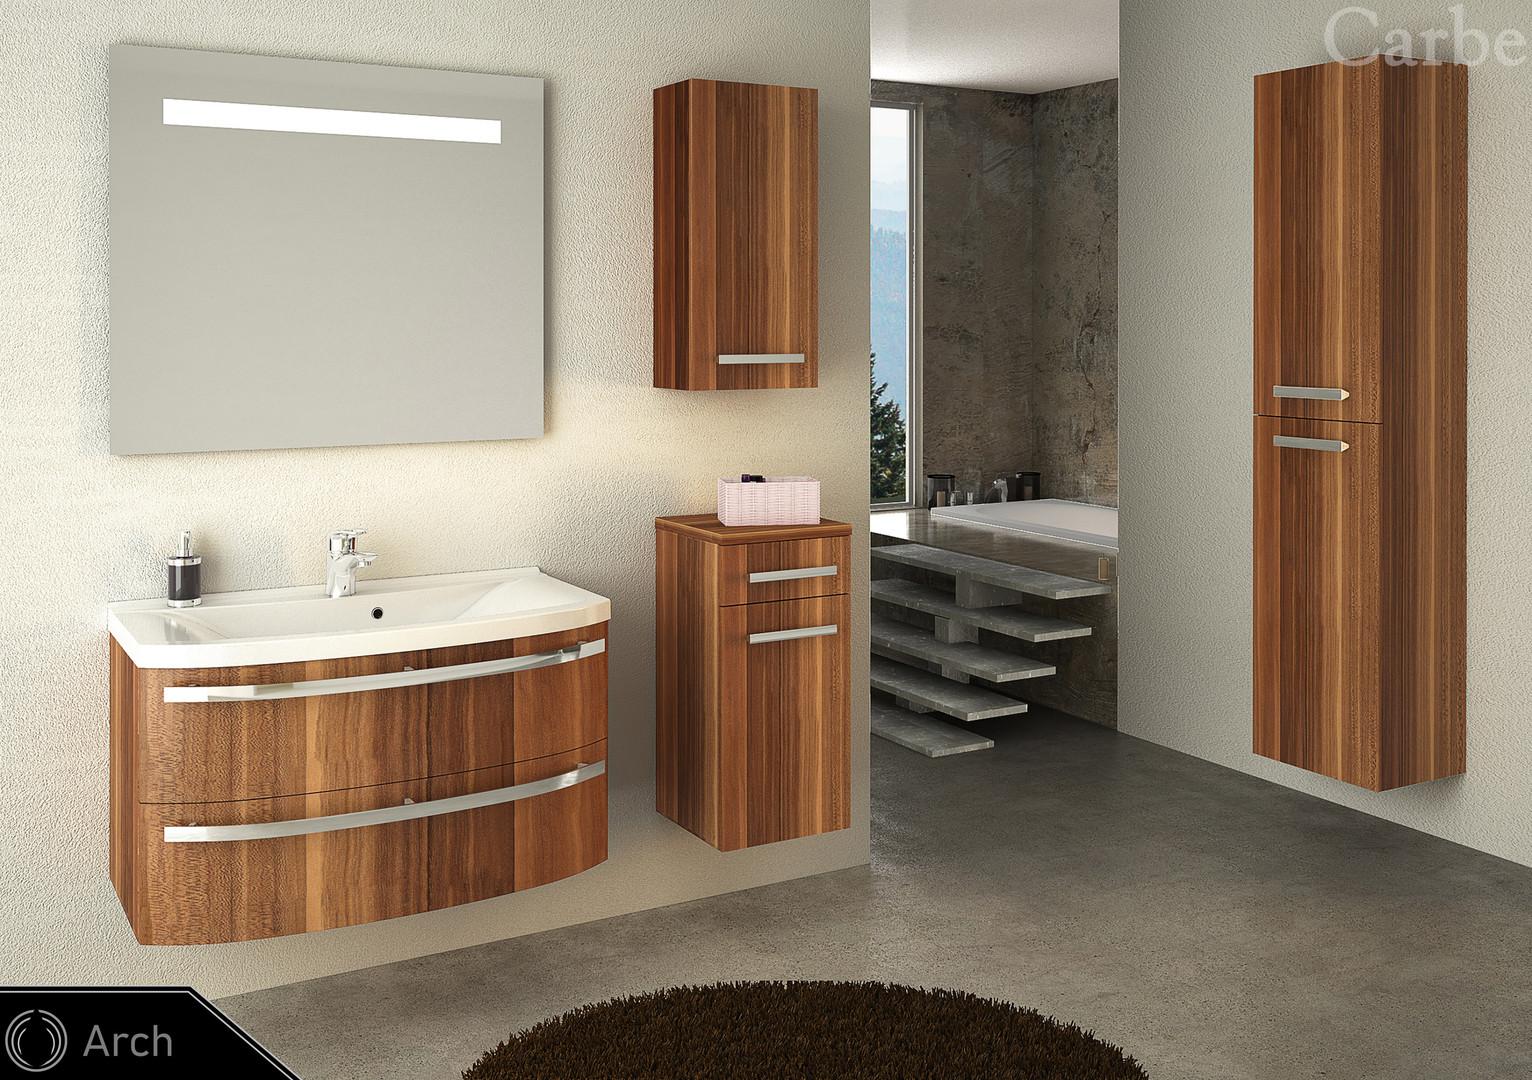 Arch - Purple Plum, Dolmite Washbasin, Soft Closing